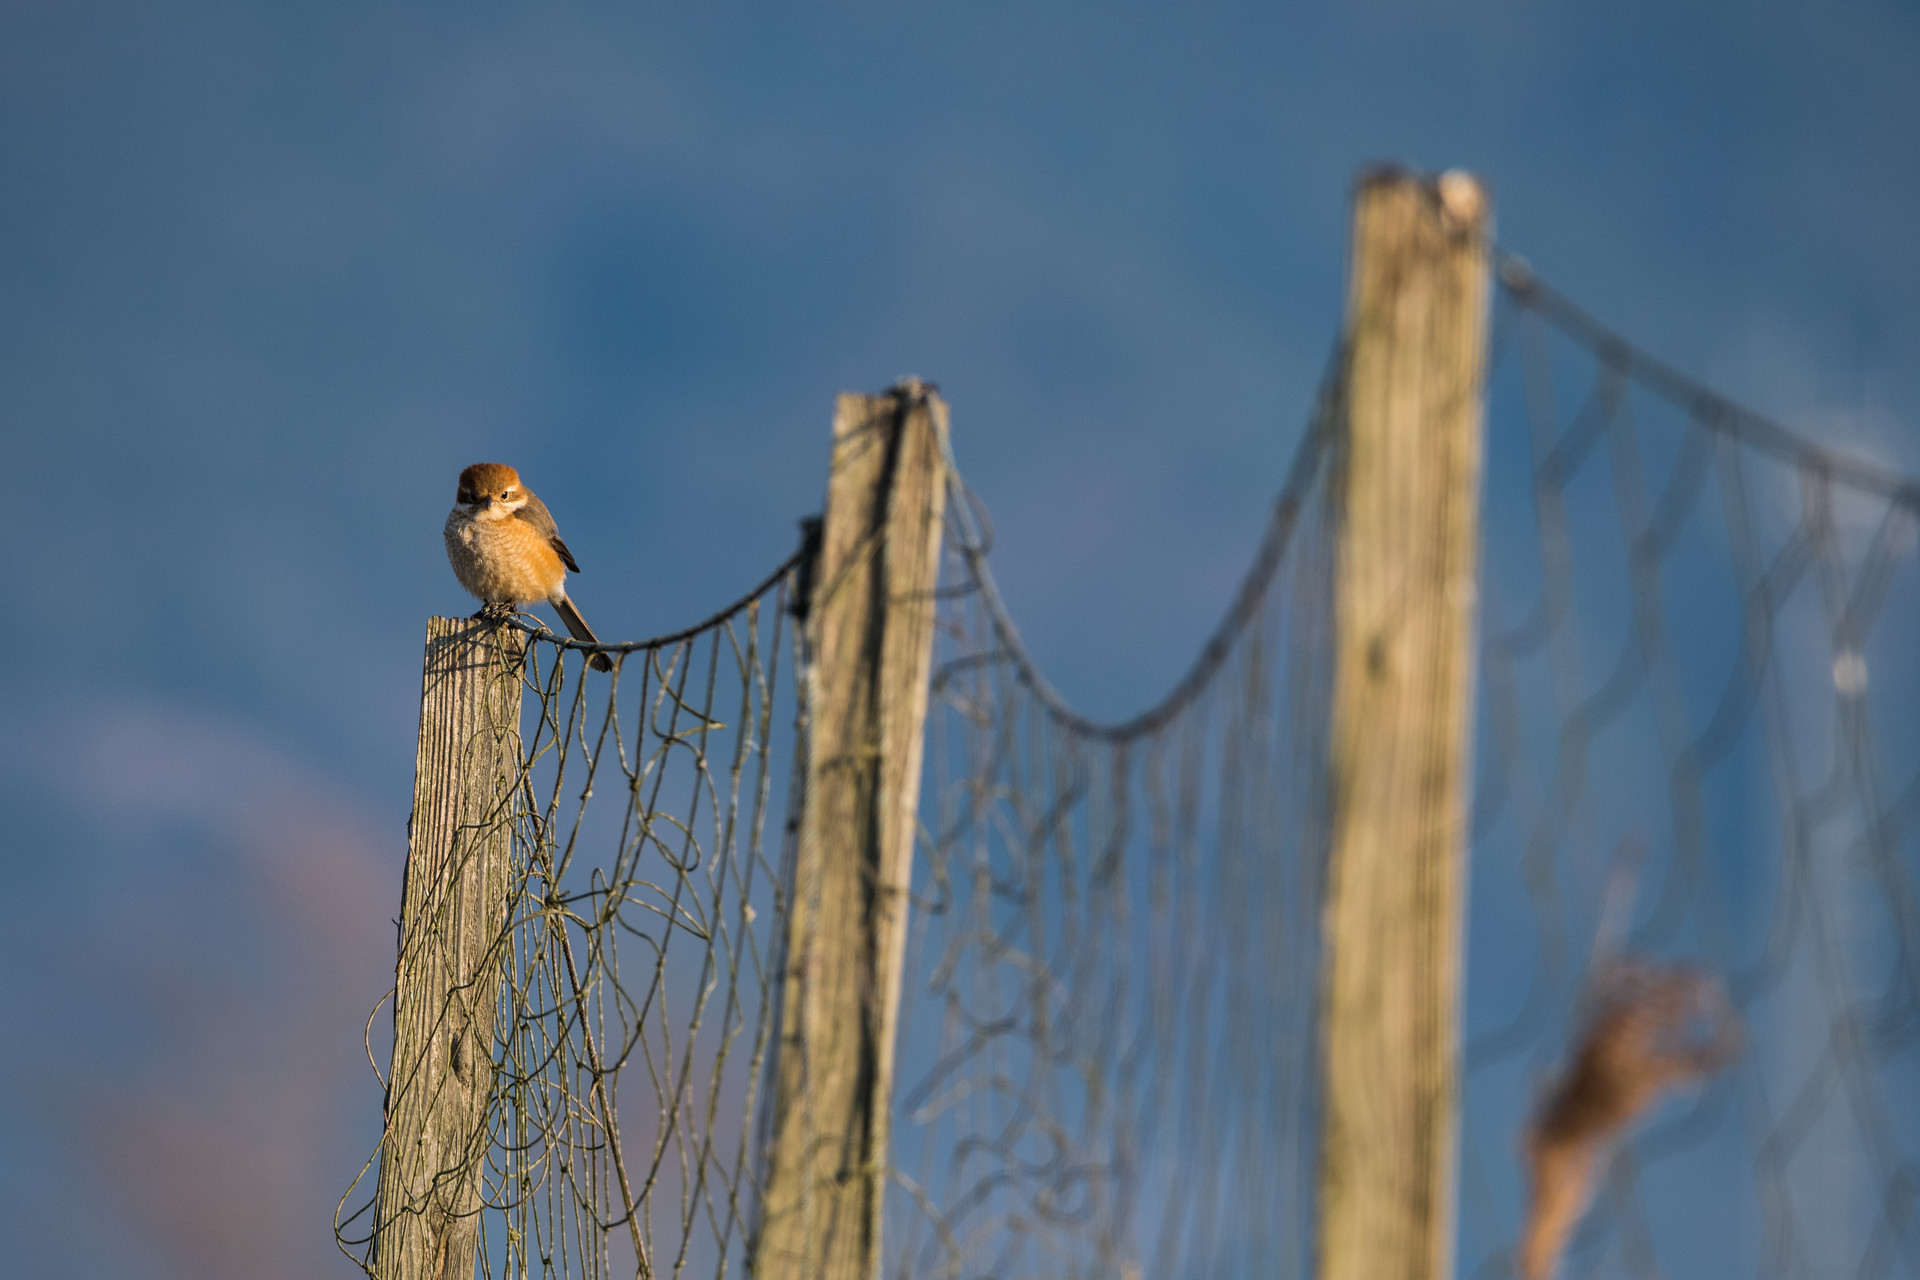 Shrike on Old Fence